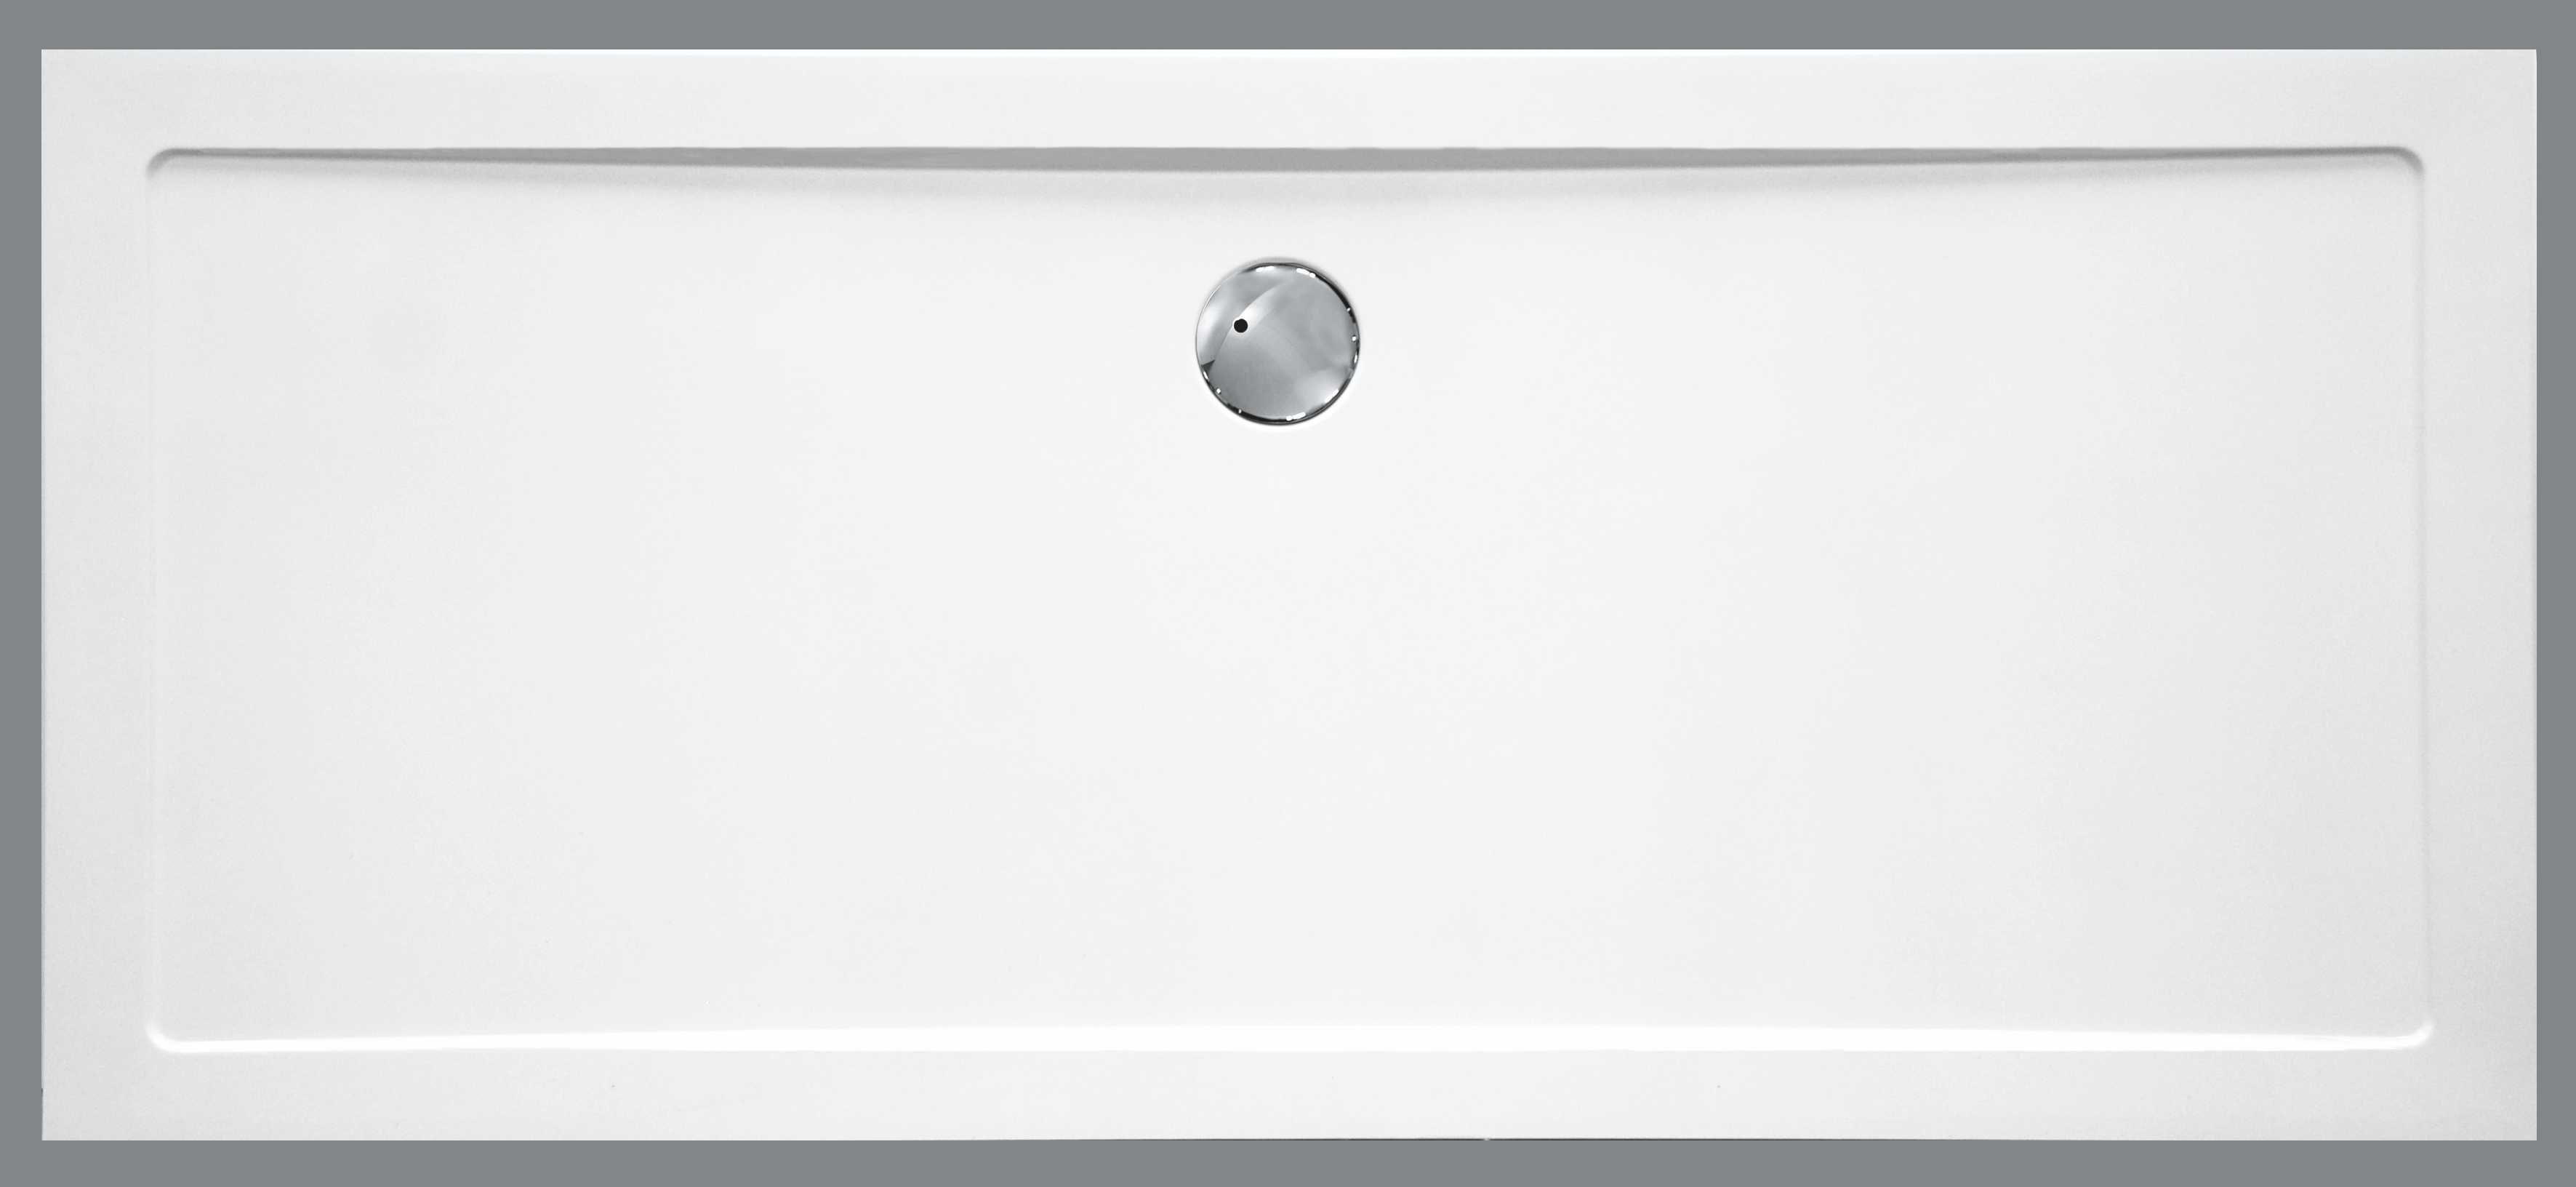 Badstuber Tris douchebak rechthoek SMC 140x90cm